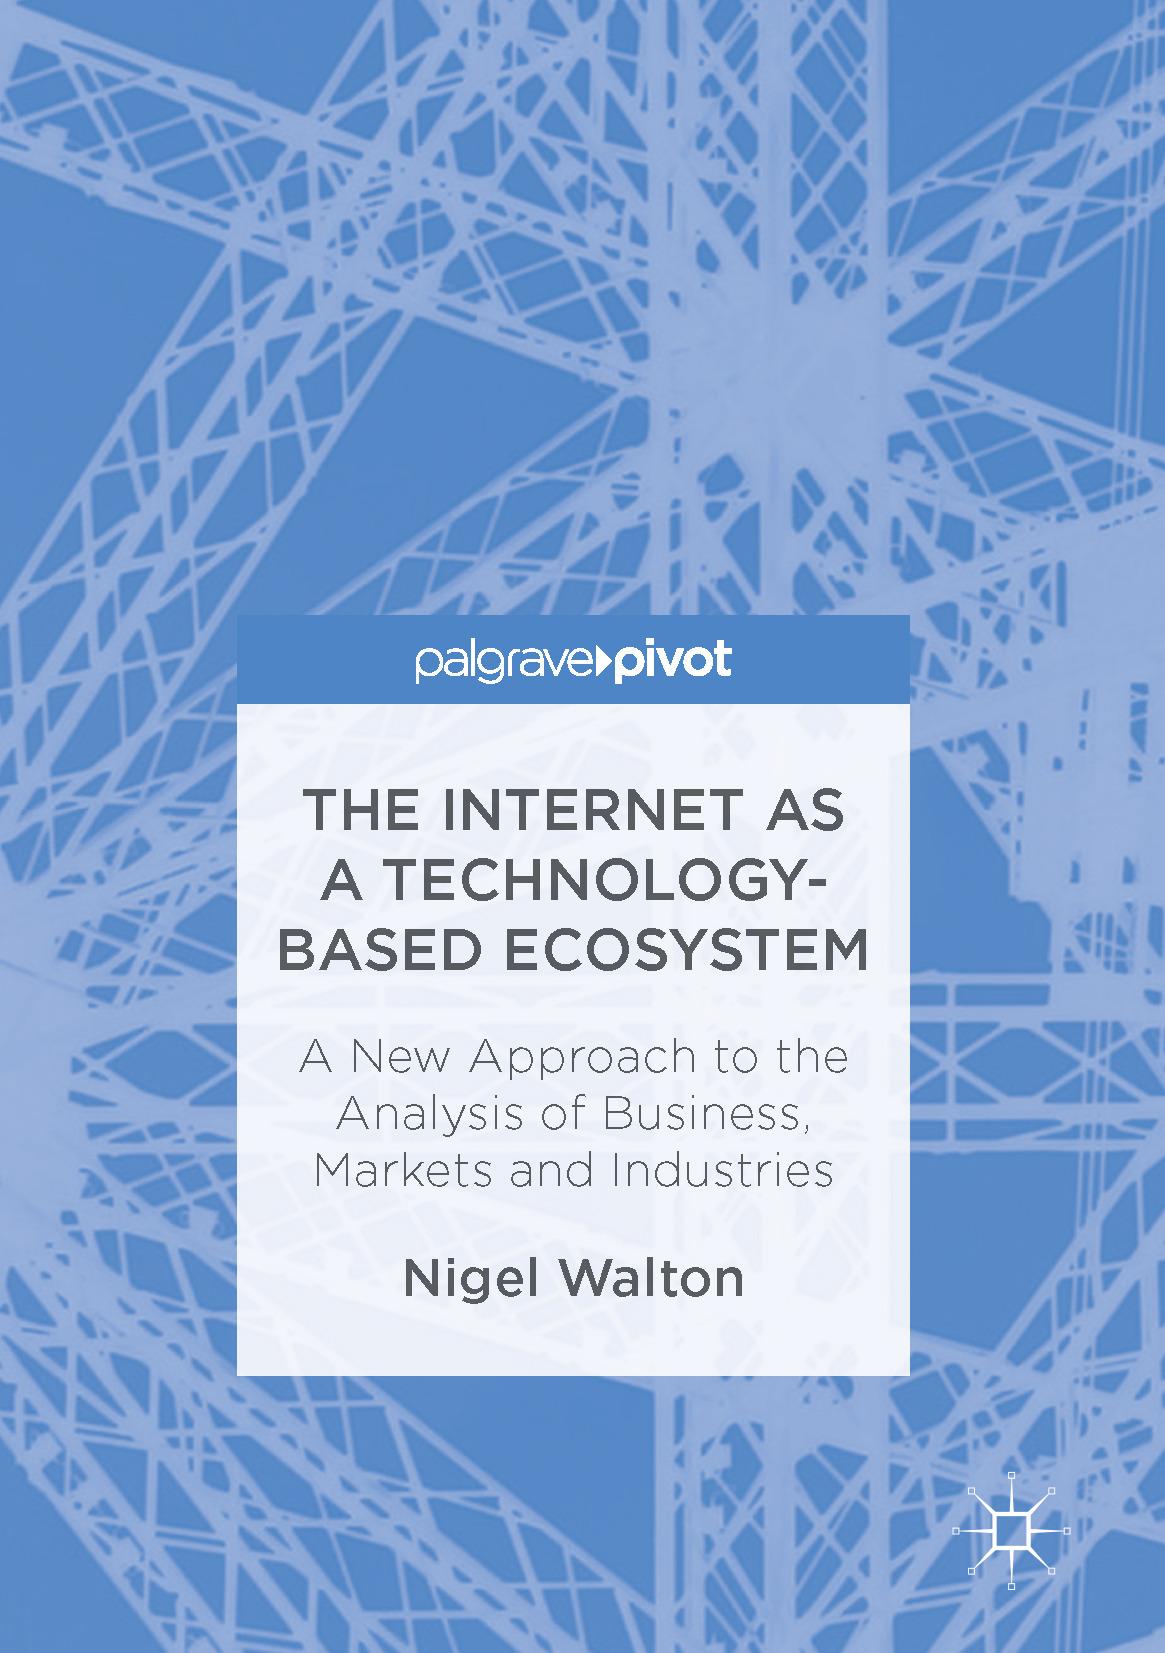 Walton, Nigel - The Internet as a Technology-Based Ecosystem, ebook